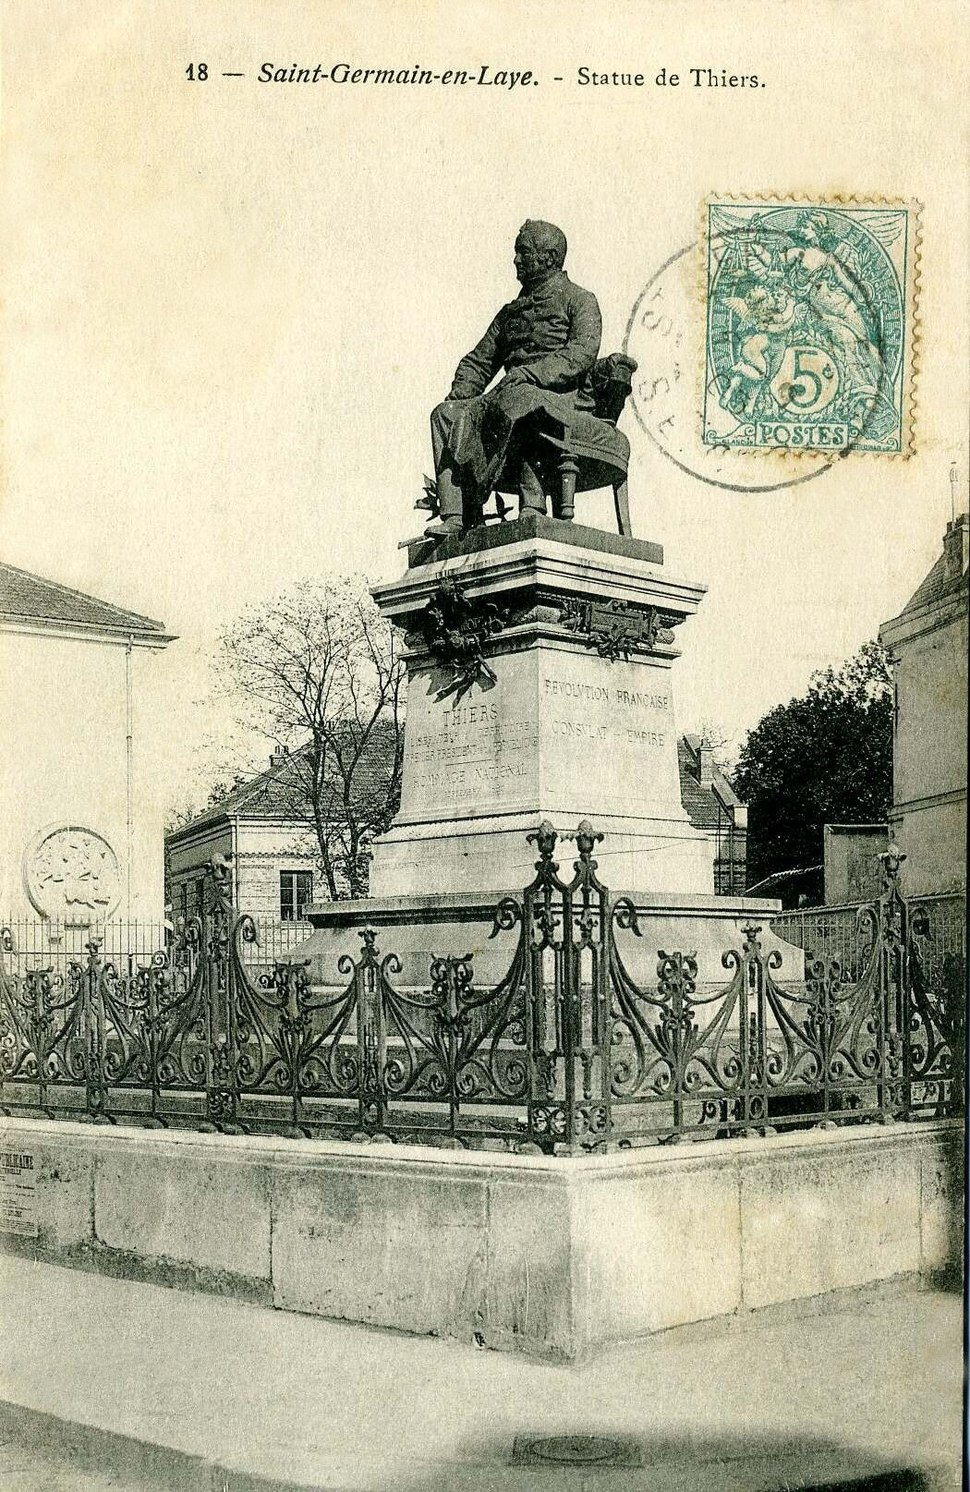 Saint-Germain-en-Laye - Statue de Thiers001